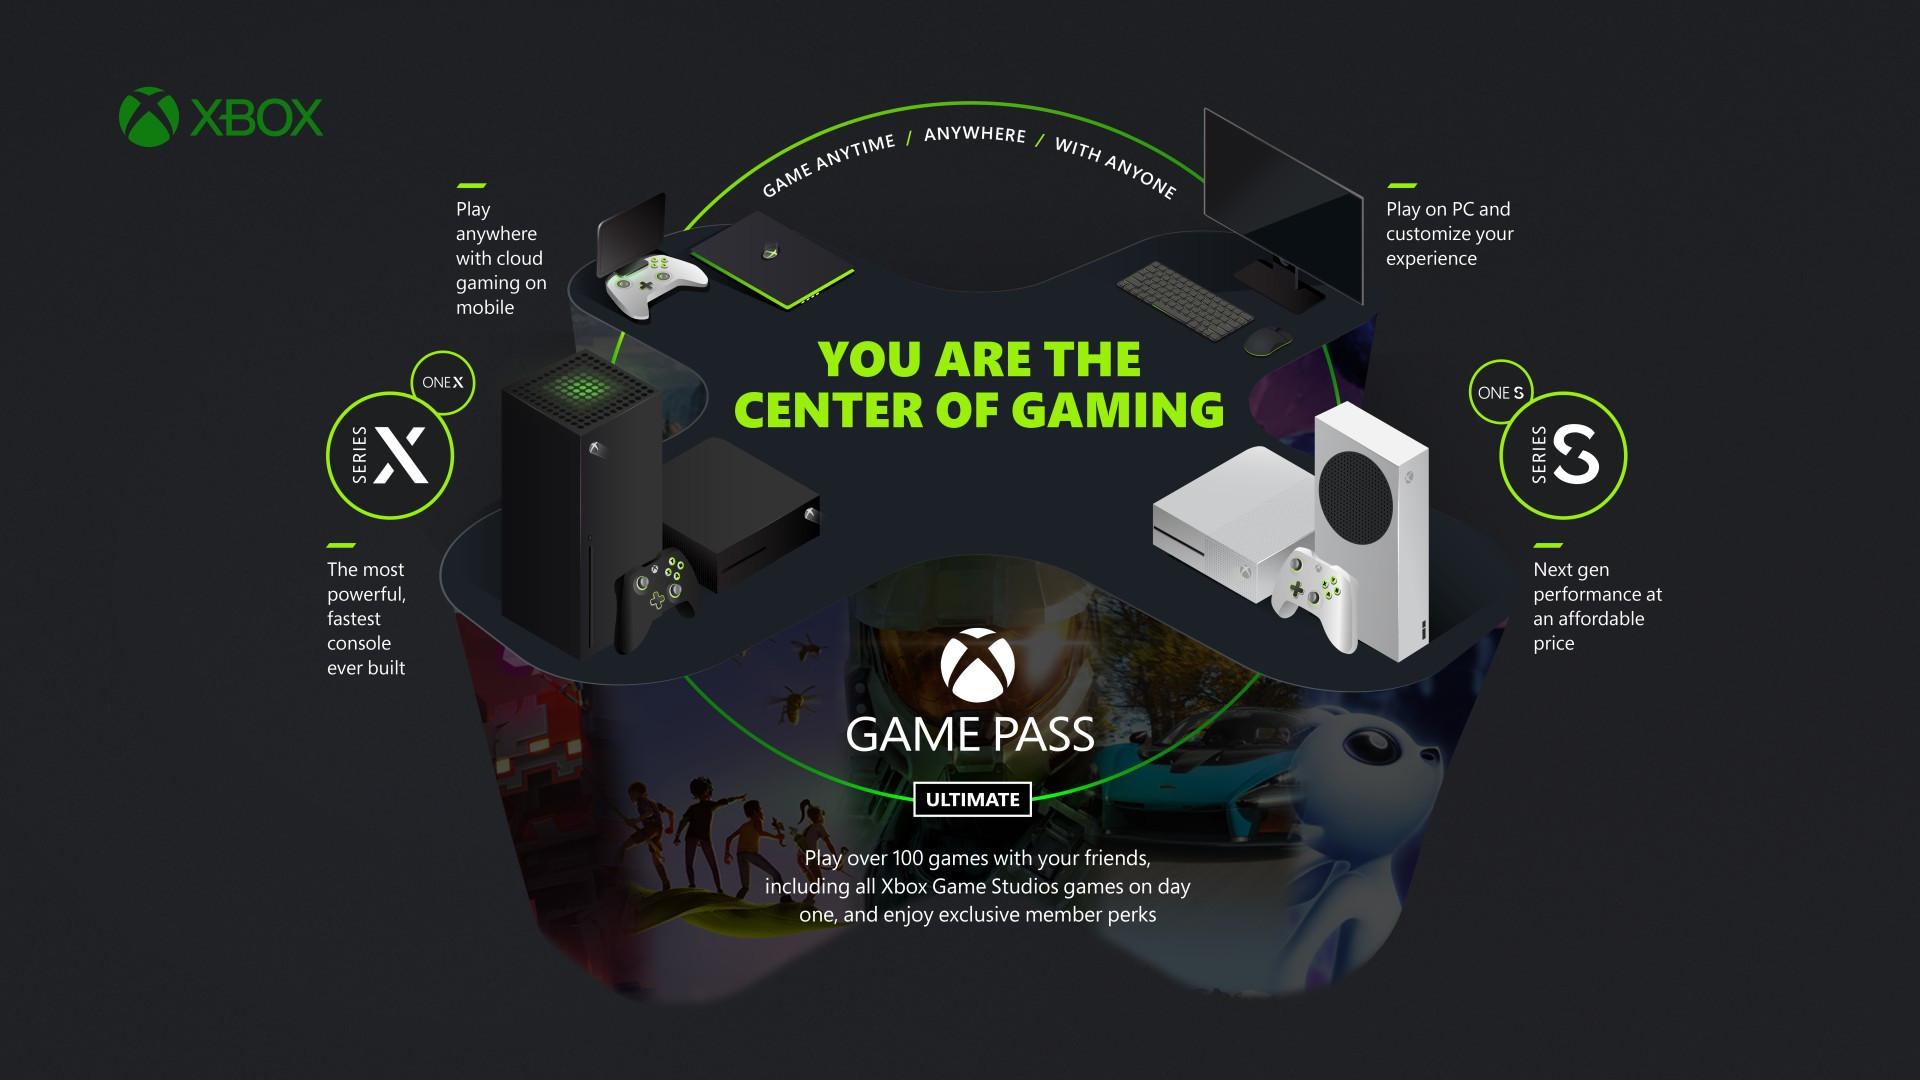 Xbox Game Pass la principal herramienta de Xbox Series X análisis